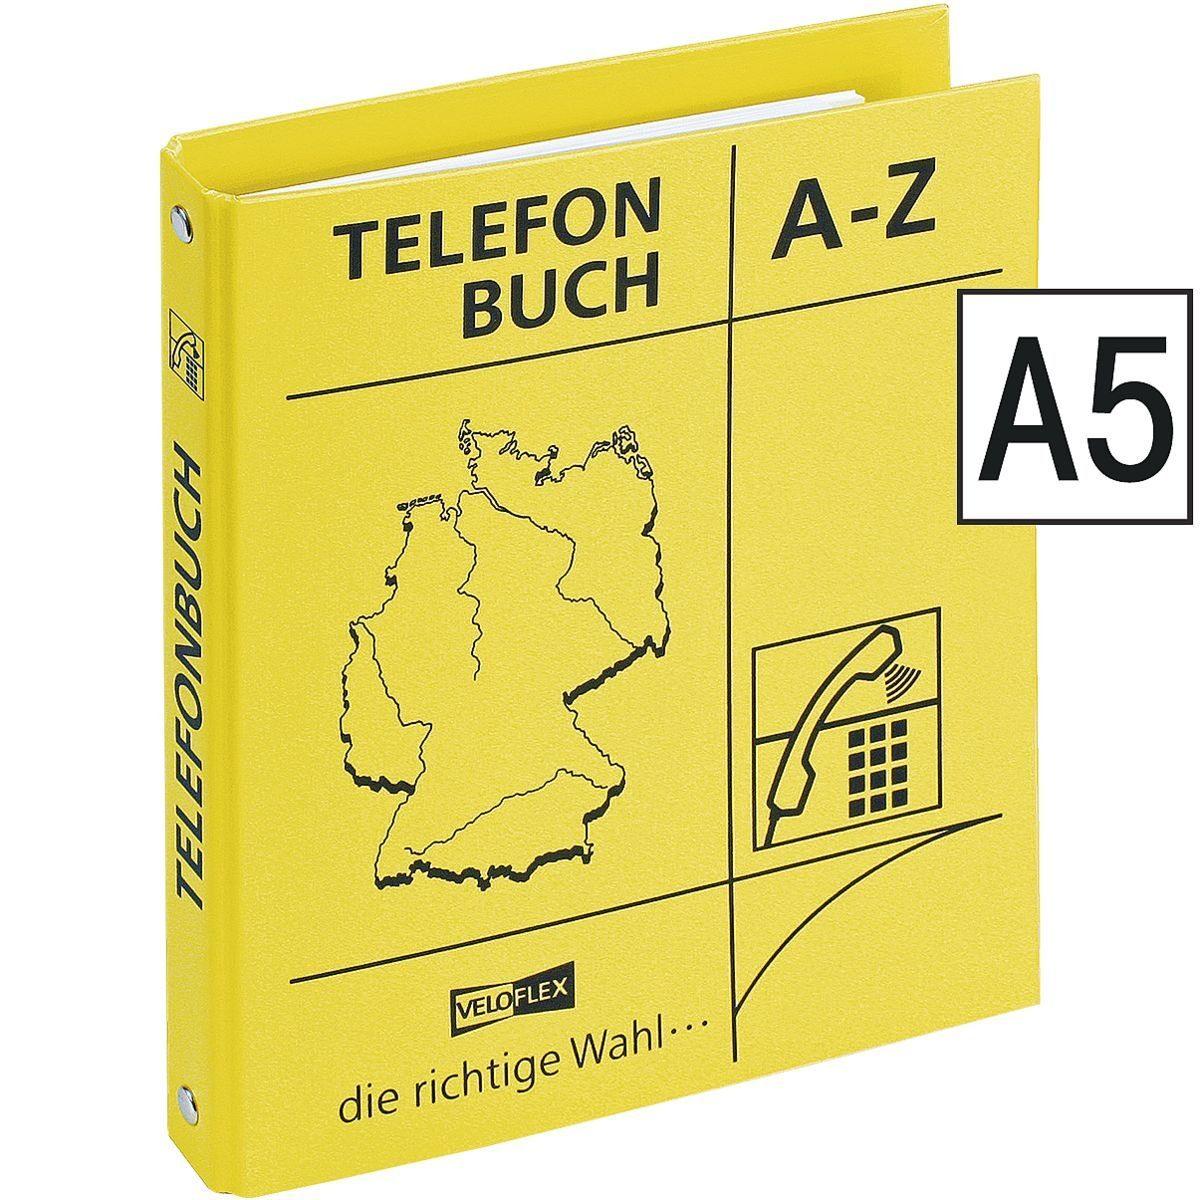 Veloflex Telefonringbuch 5158000